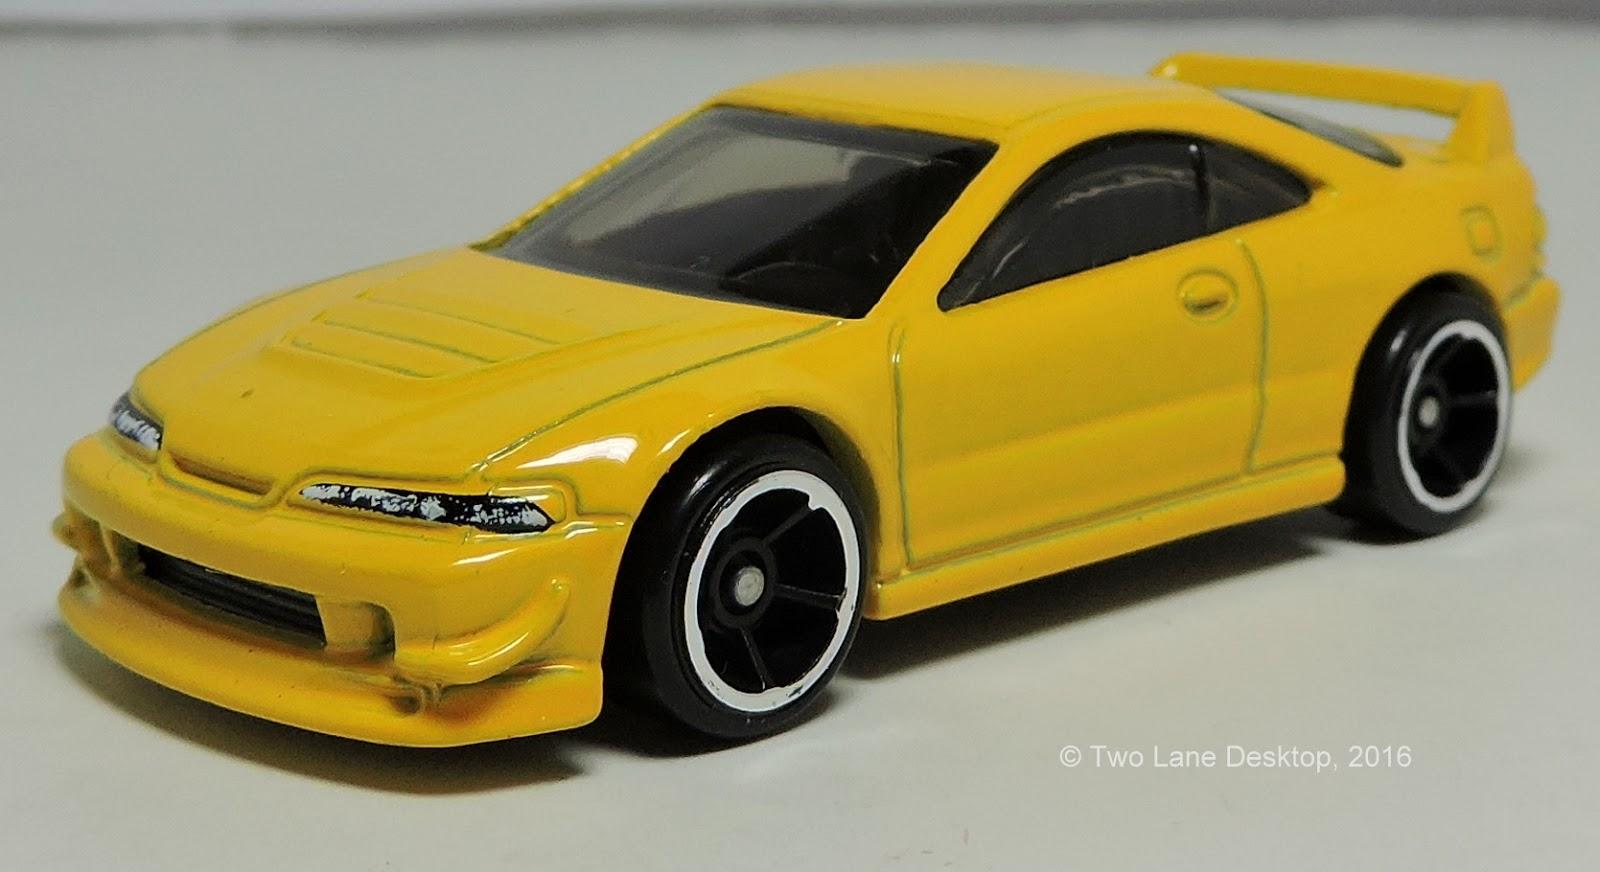 Acura-Integra-GS-R-Coupe-1994-1998-Photo-01 1994 Acura Integra Coupe